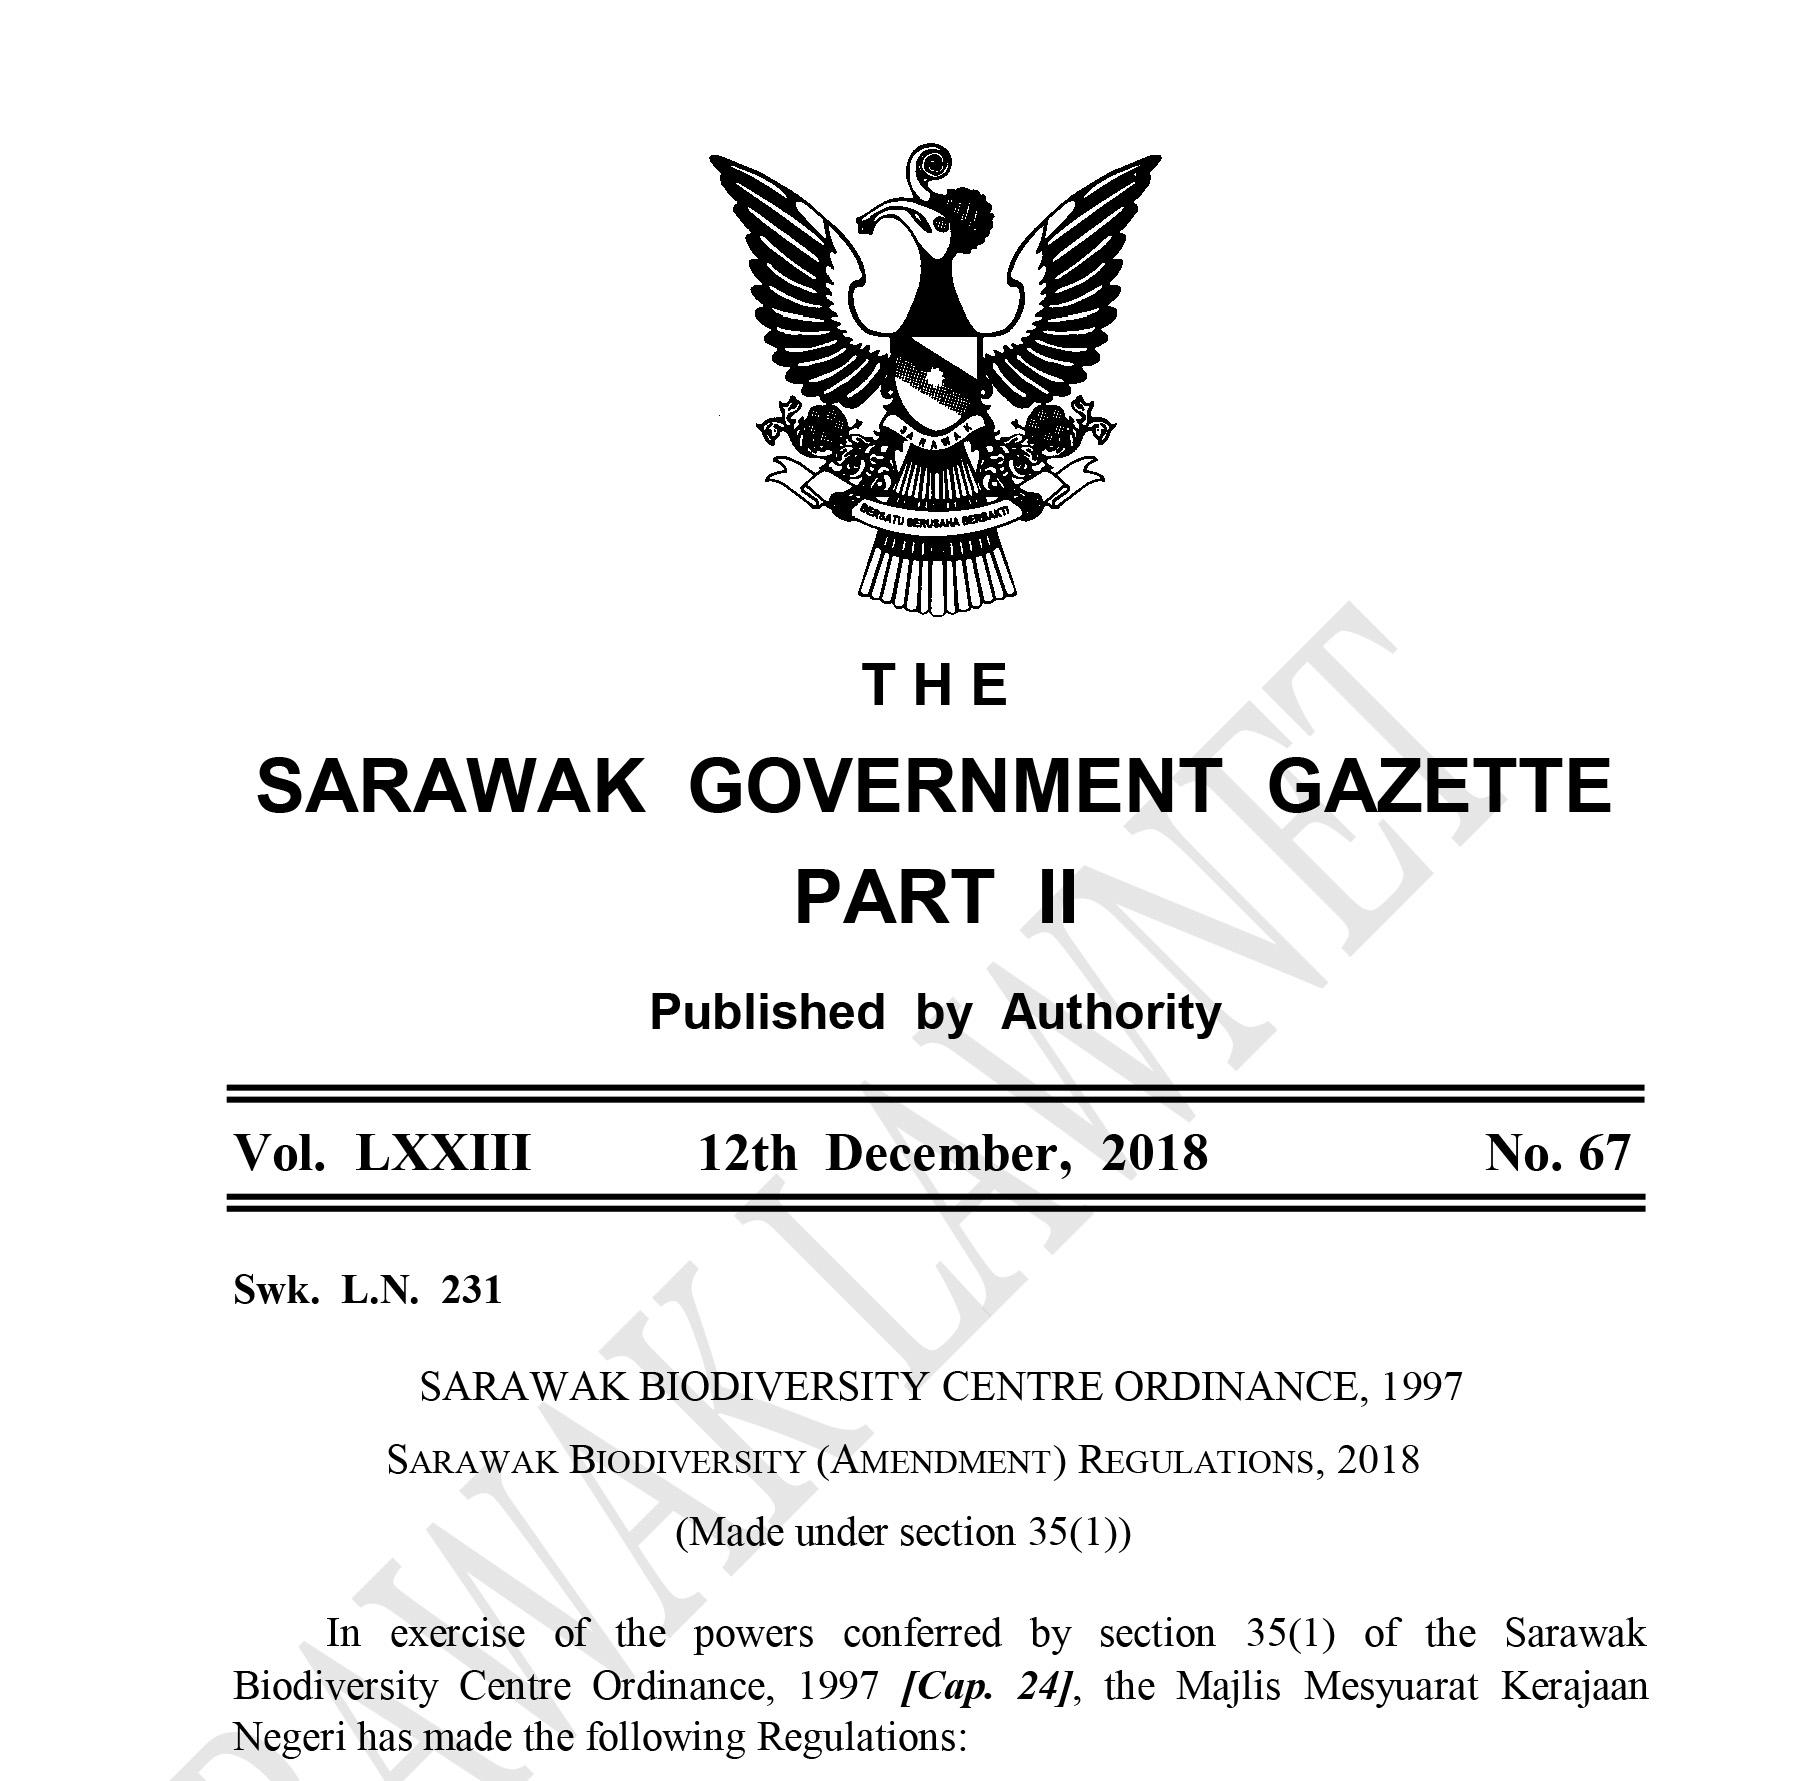 Sarawak Biodiversity Regulations (Amendment) 2018